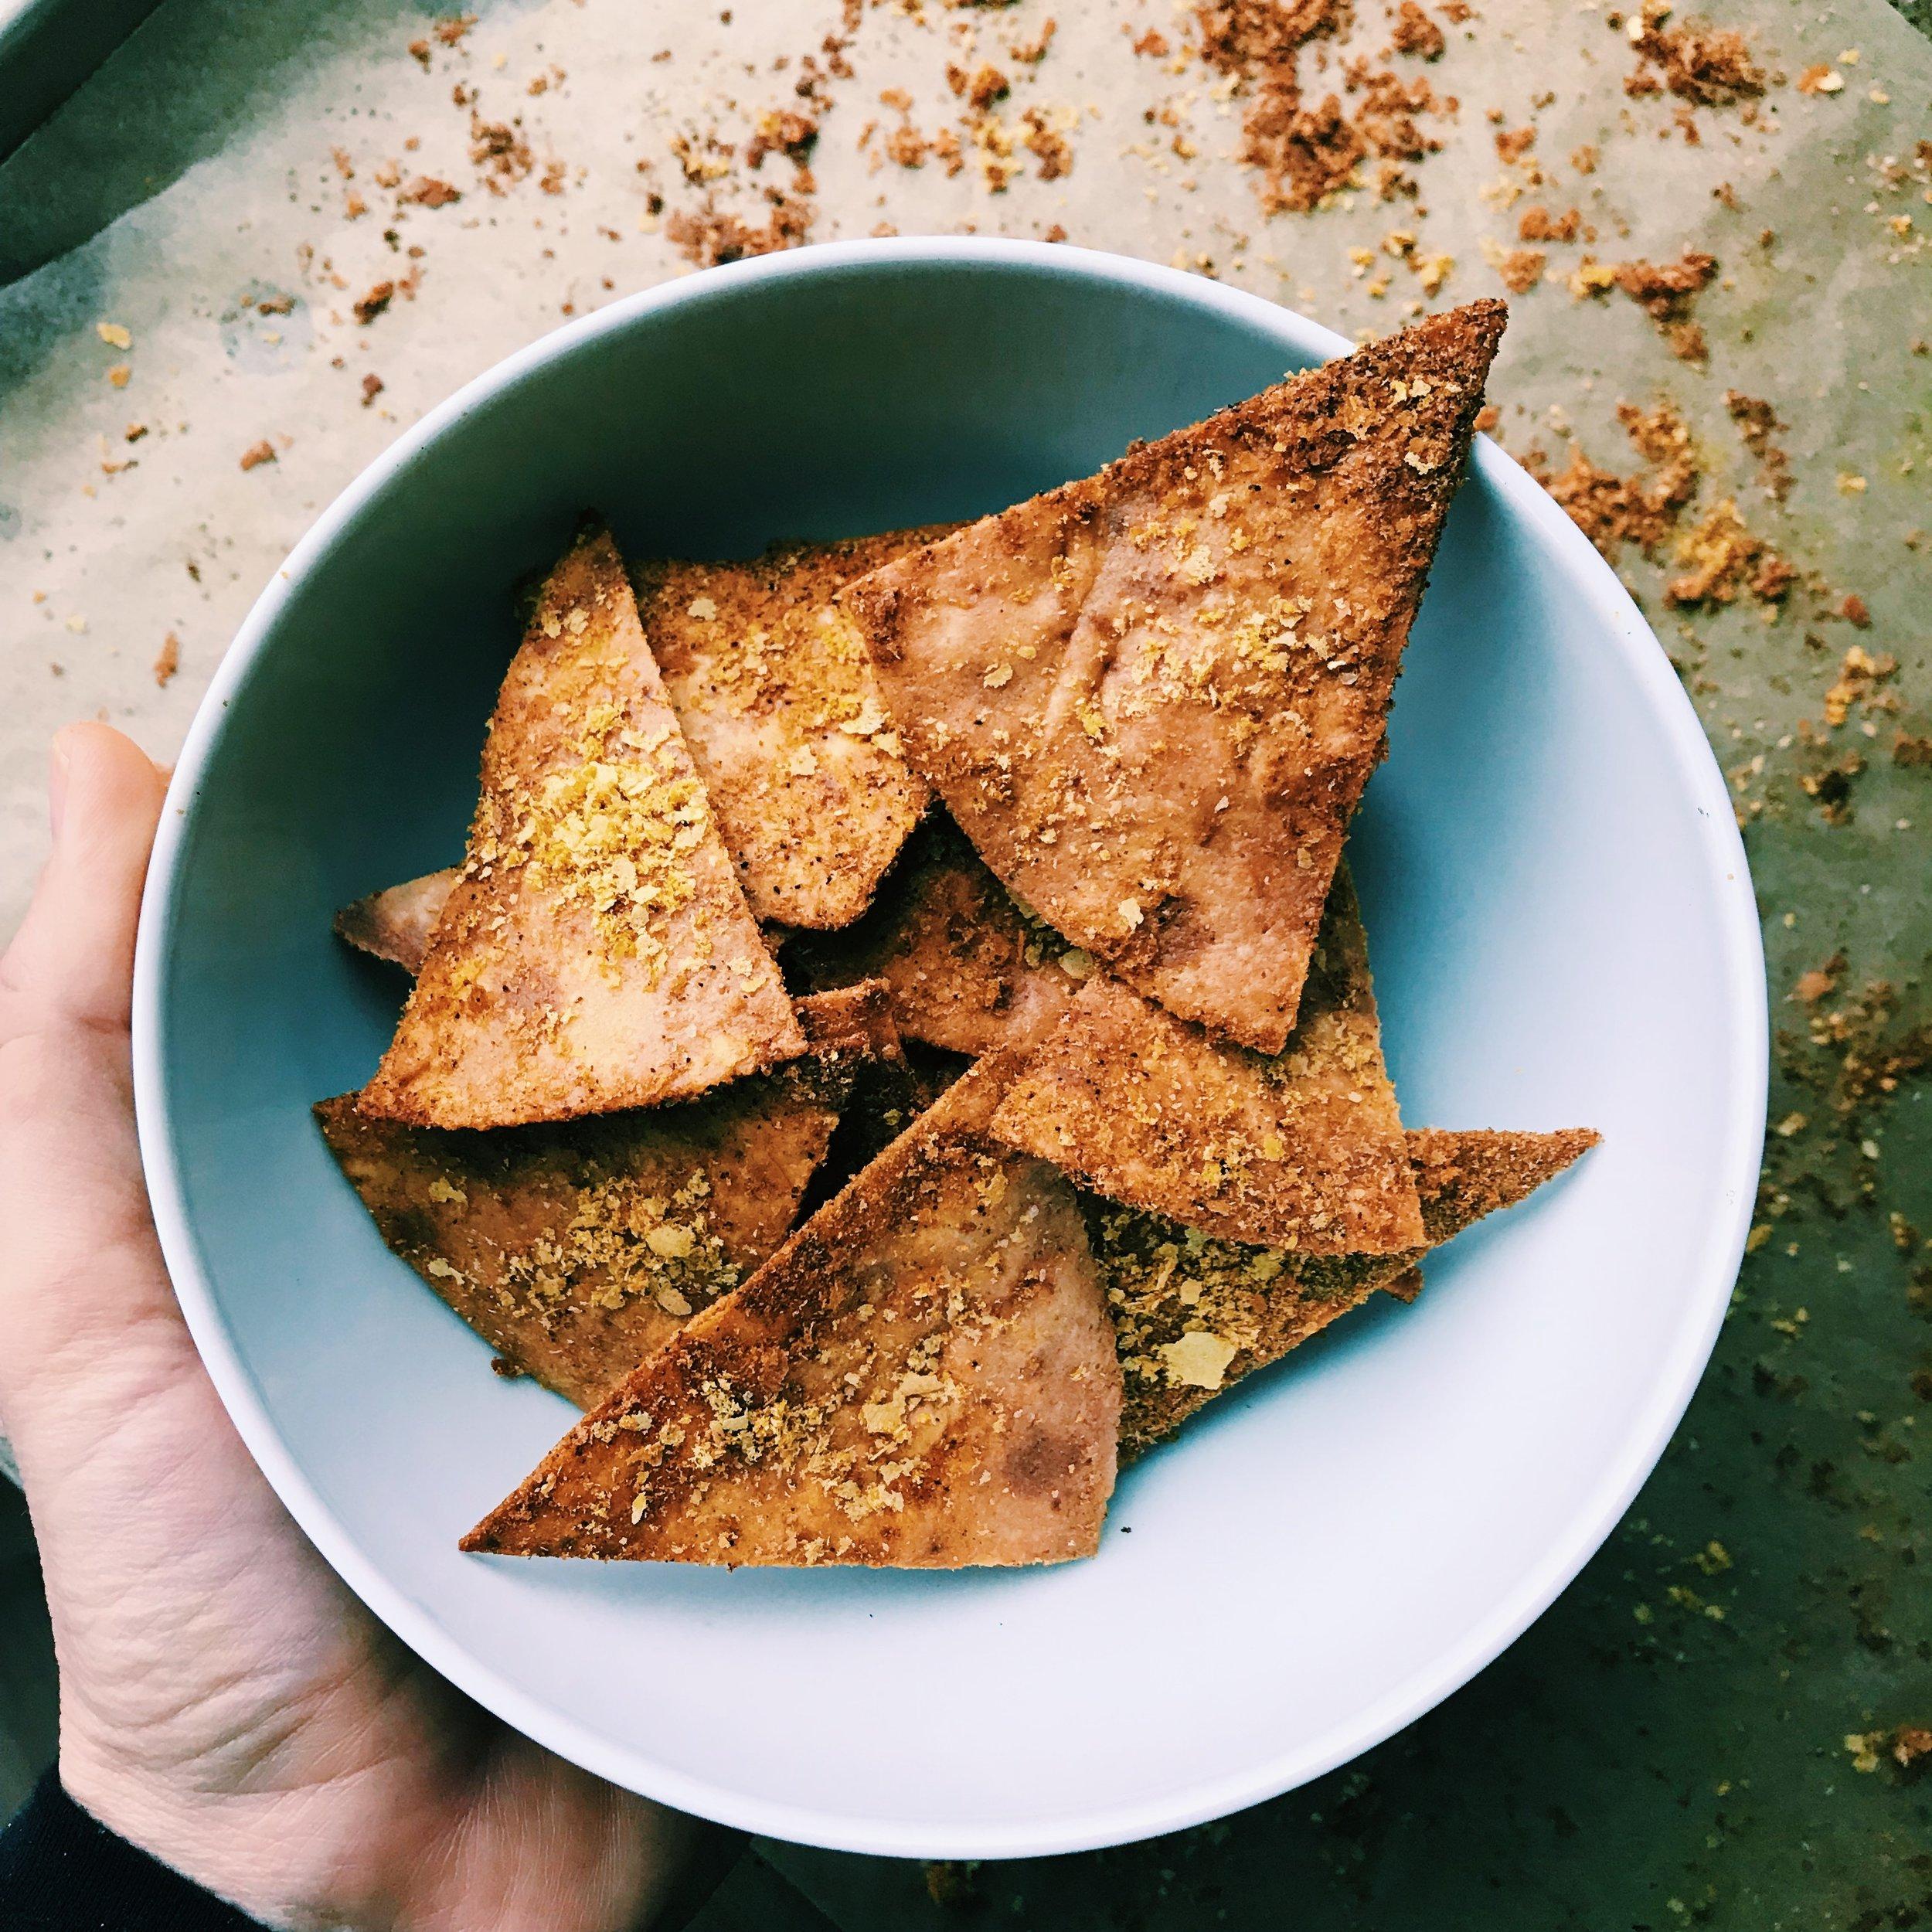 homemade_nacho2.JPG